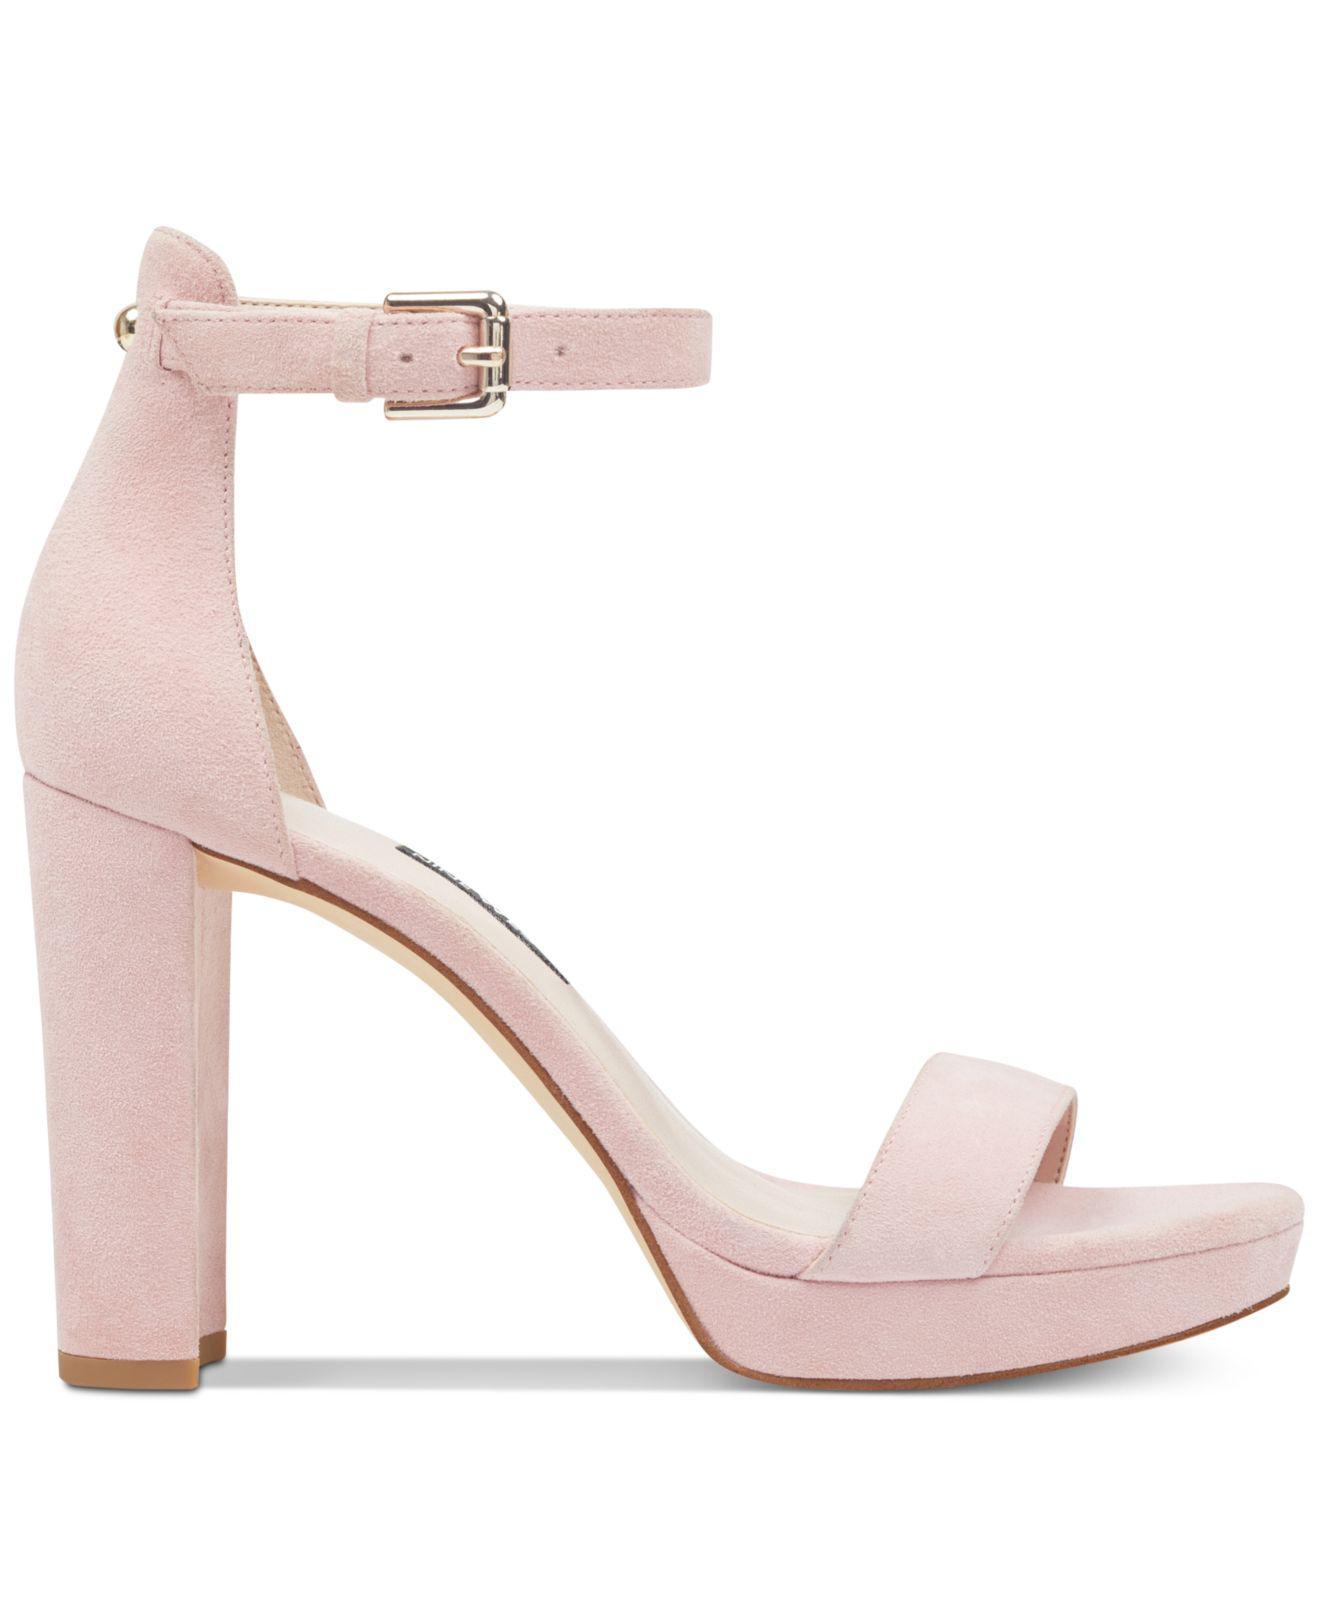 a38707887247 Lyst - Nine West Dempsey Platform Sandals in Pink